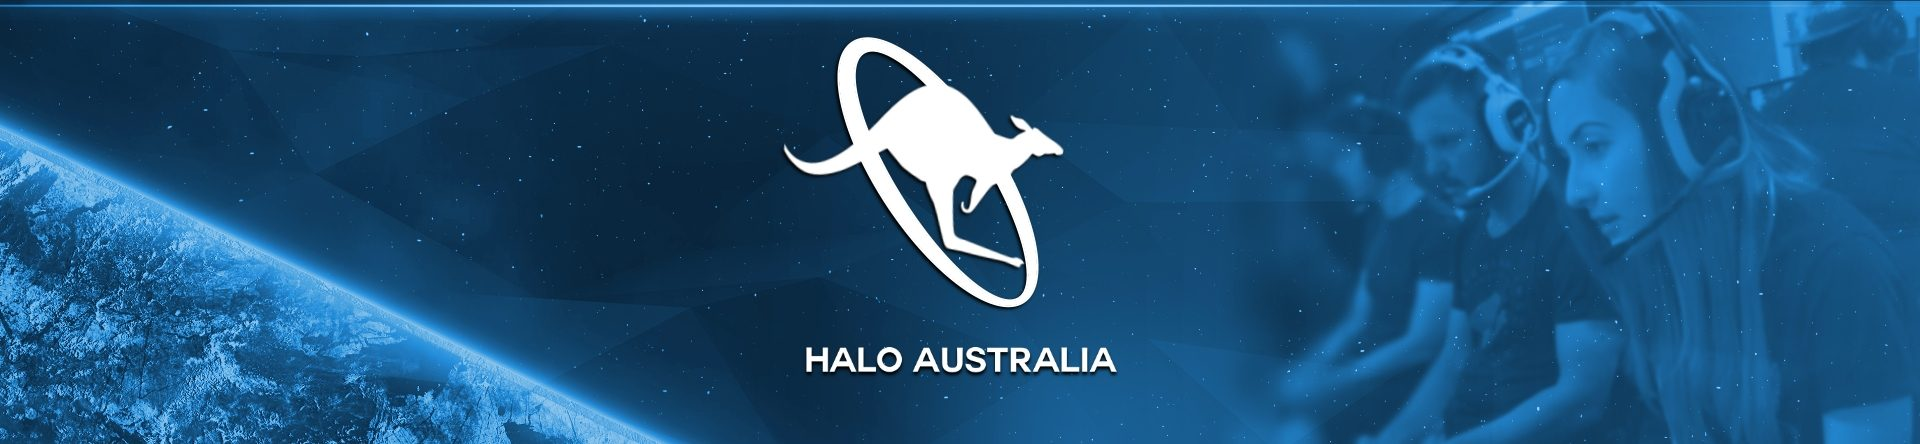 Halo Australia